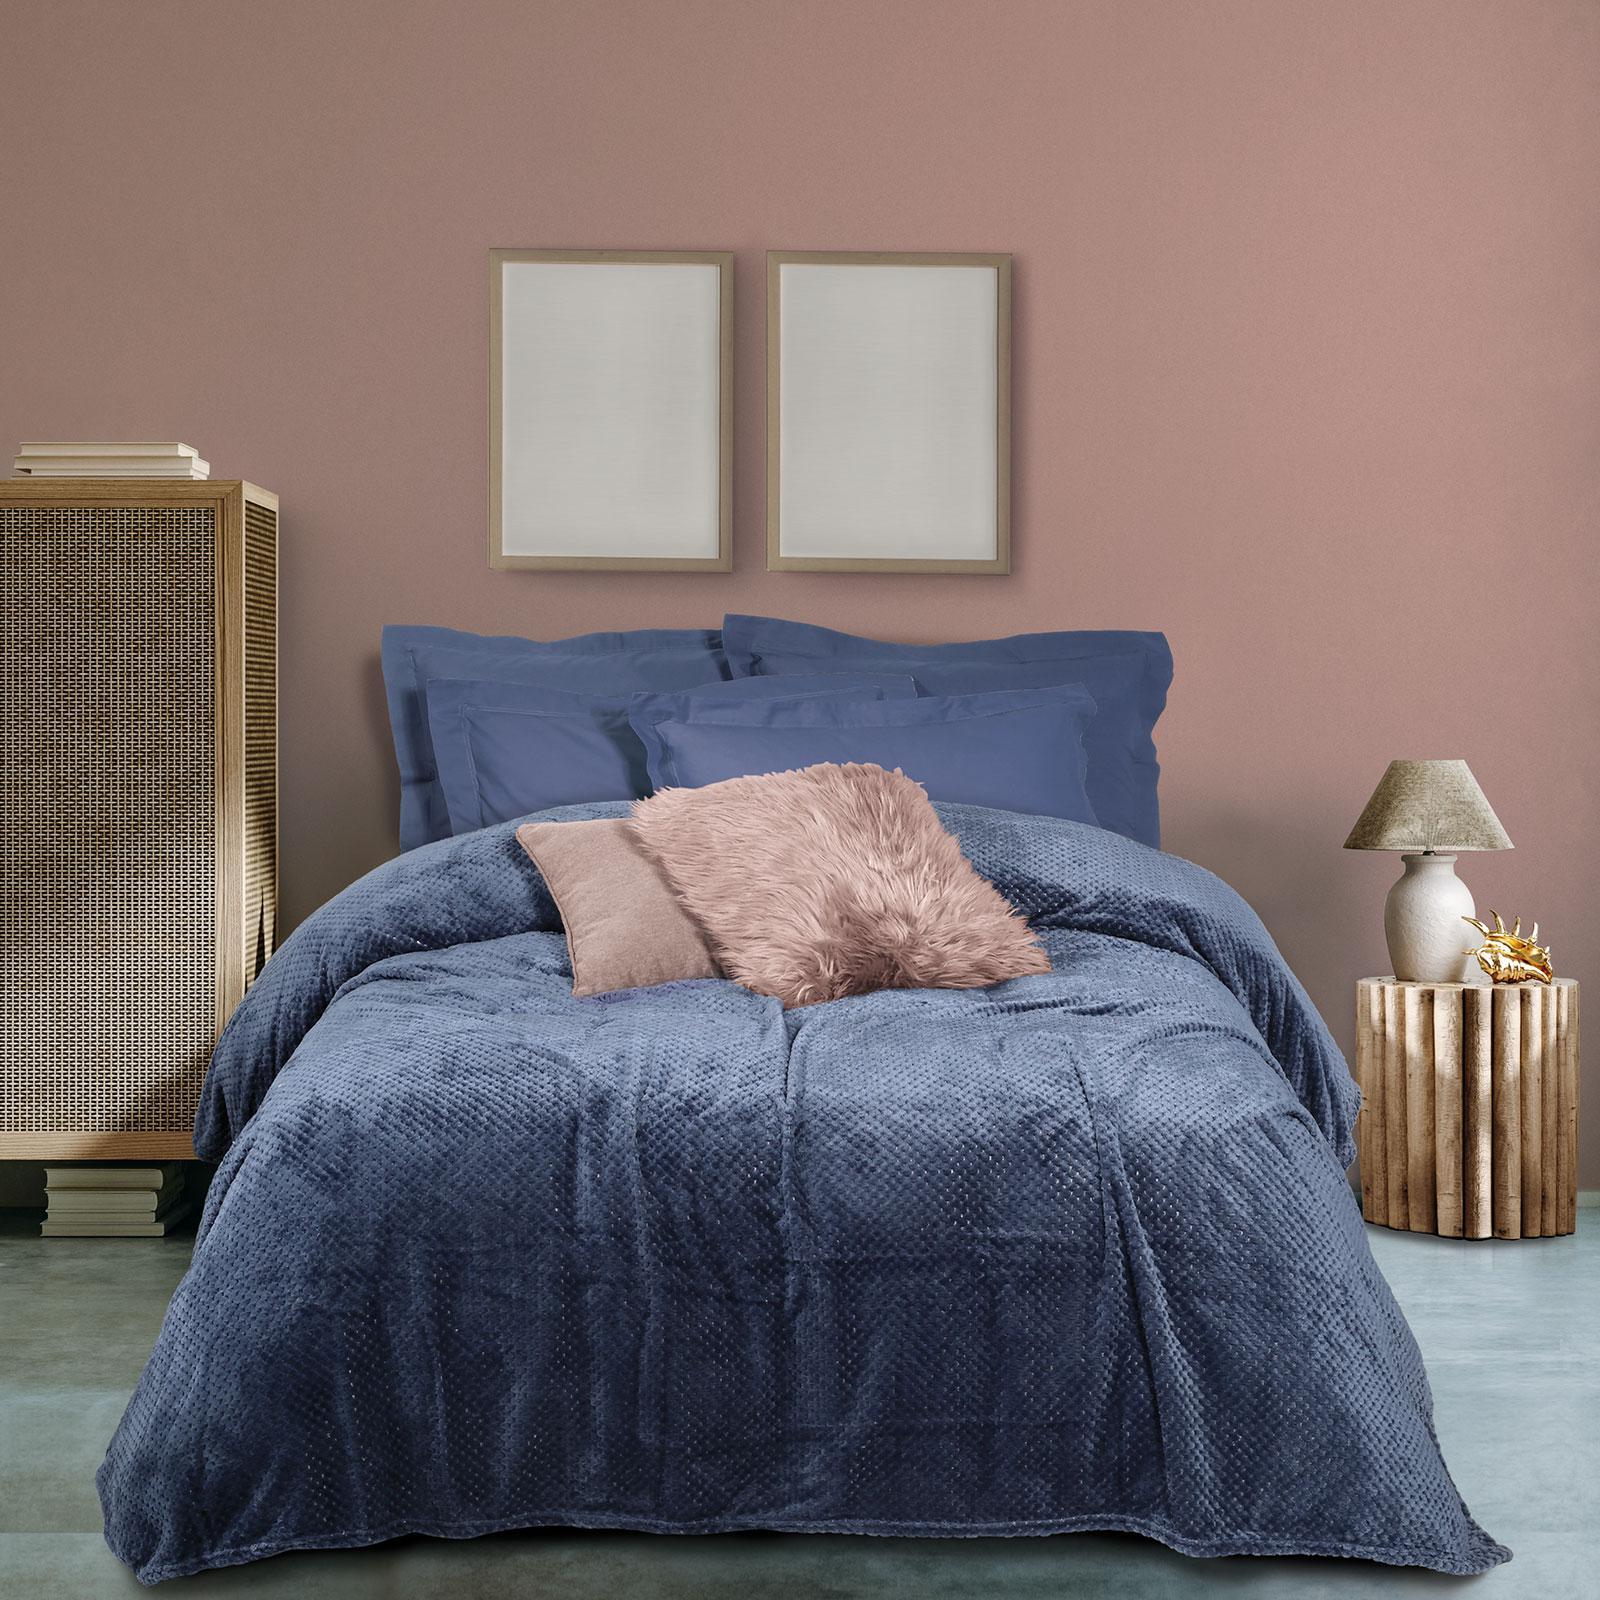 Das Home Κουβερτα Fleece 160Χ220 0468 Μπλε